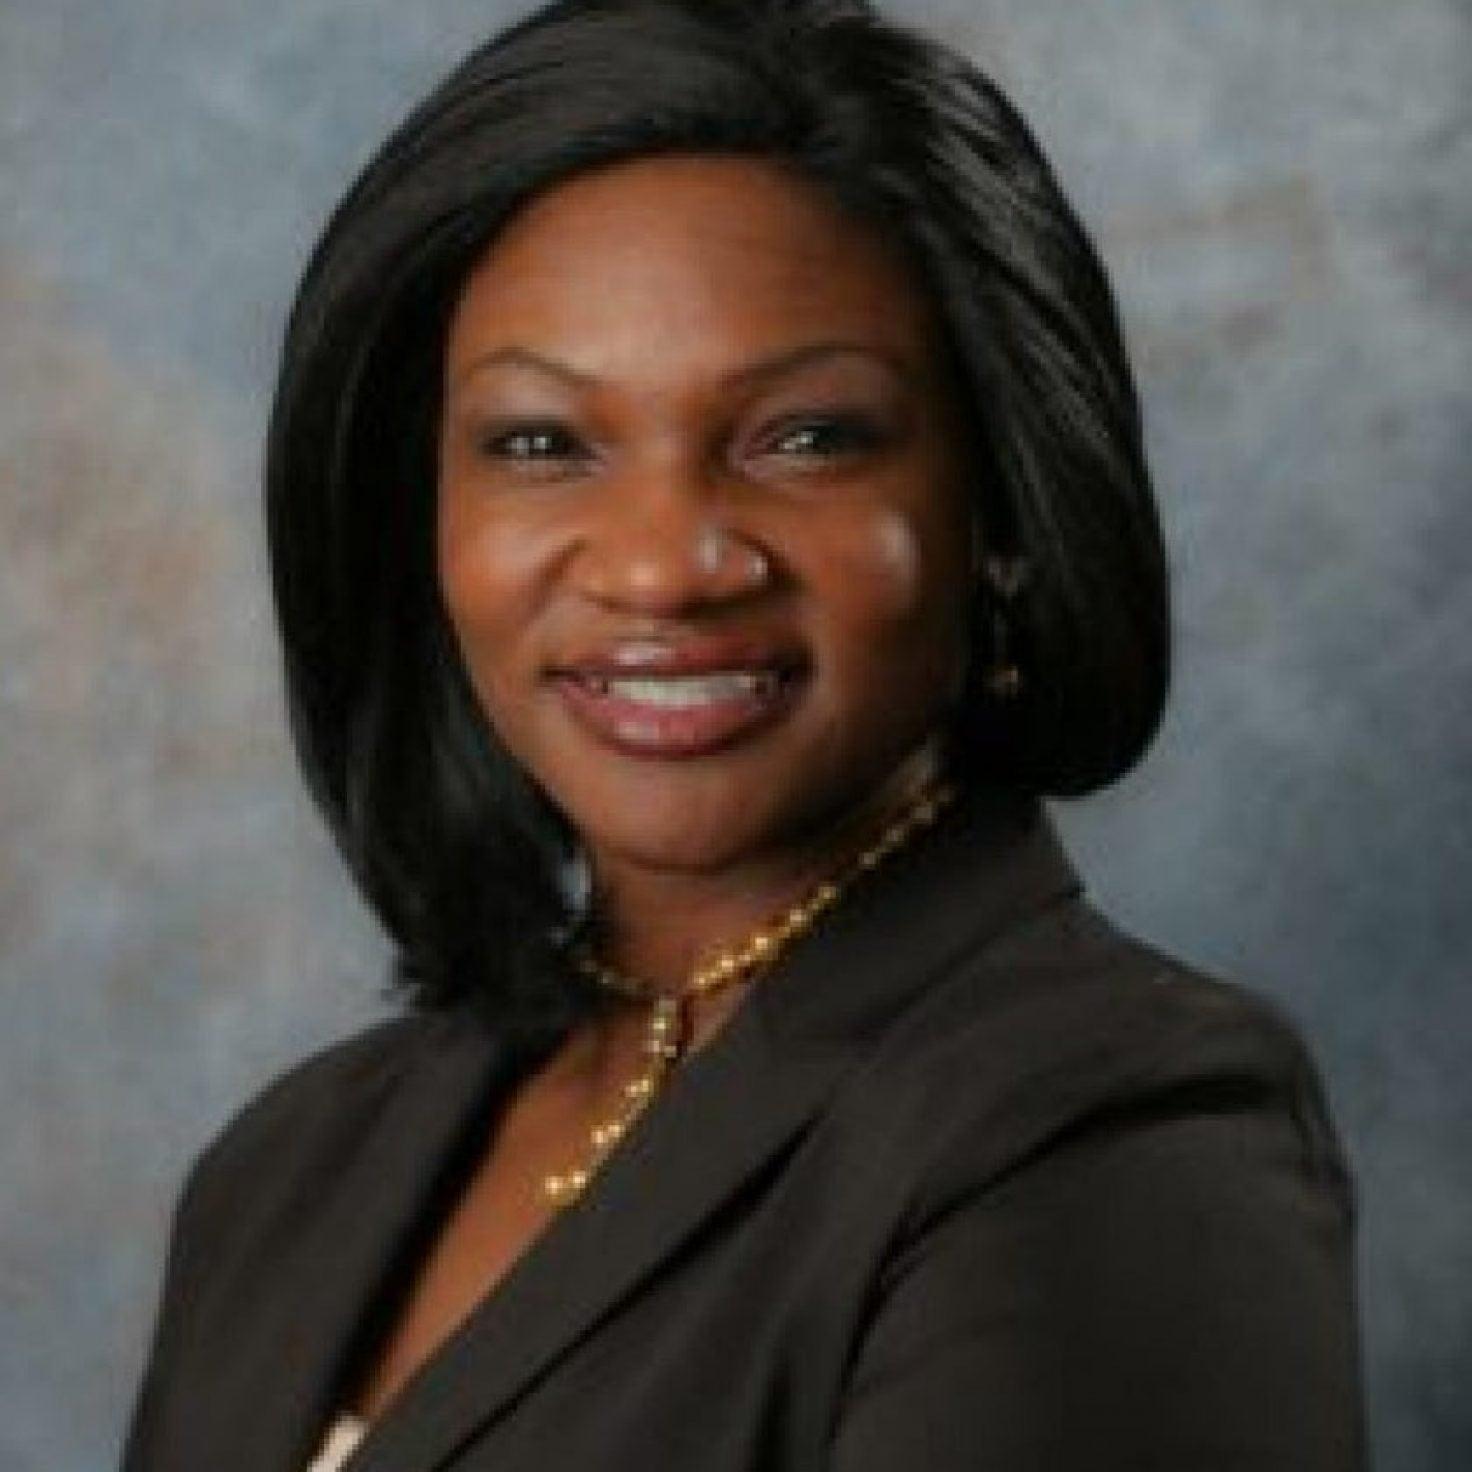 Dawn Freeman's Mission To Help Returning Citizens Restart Their Lives